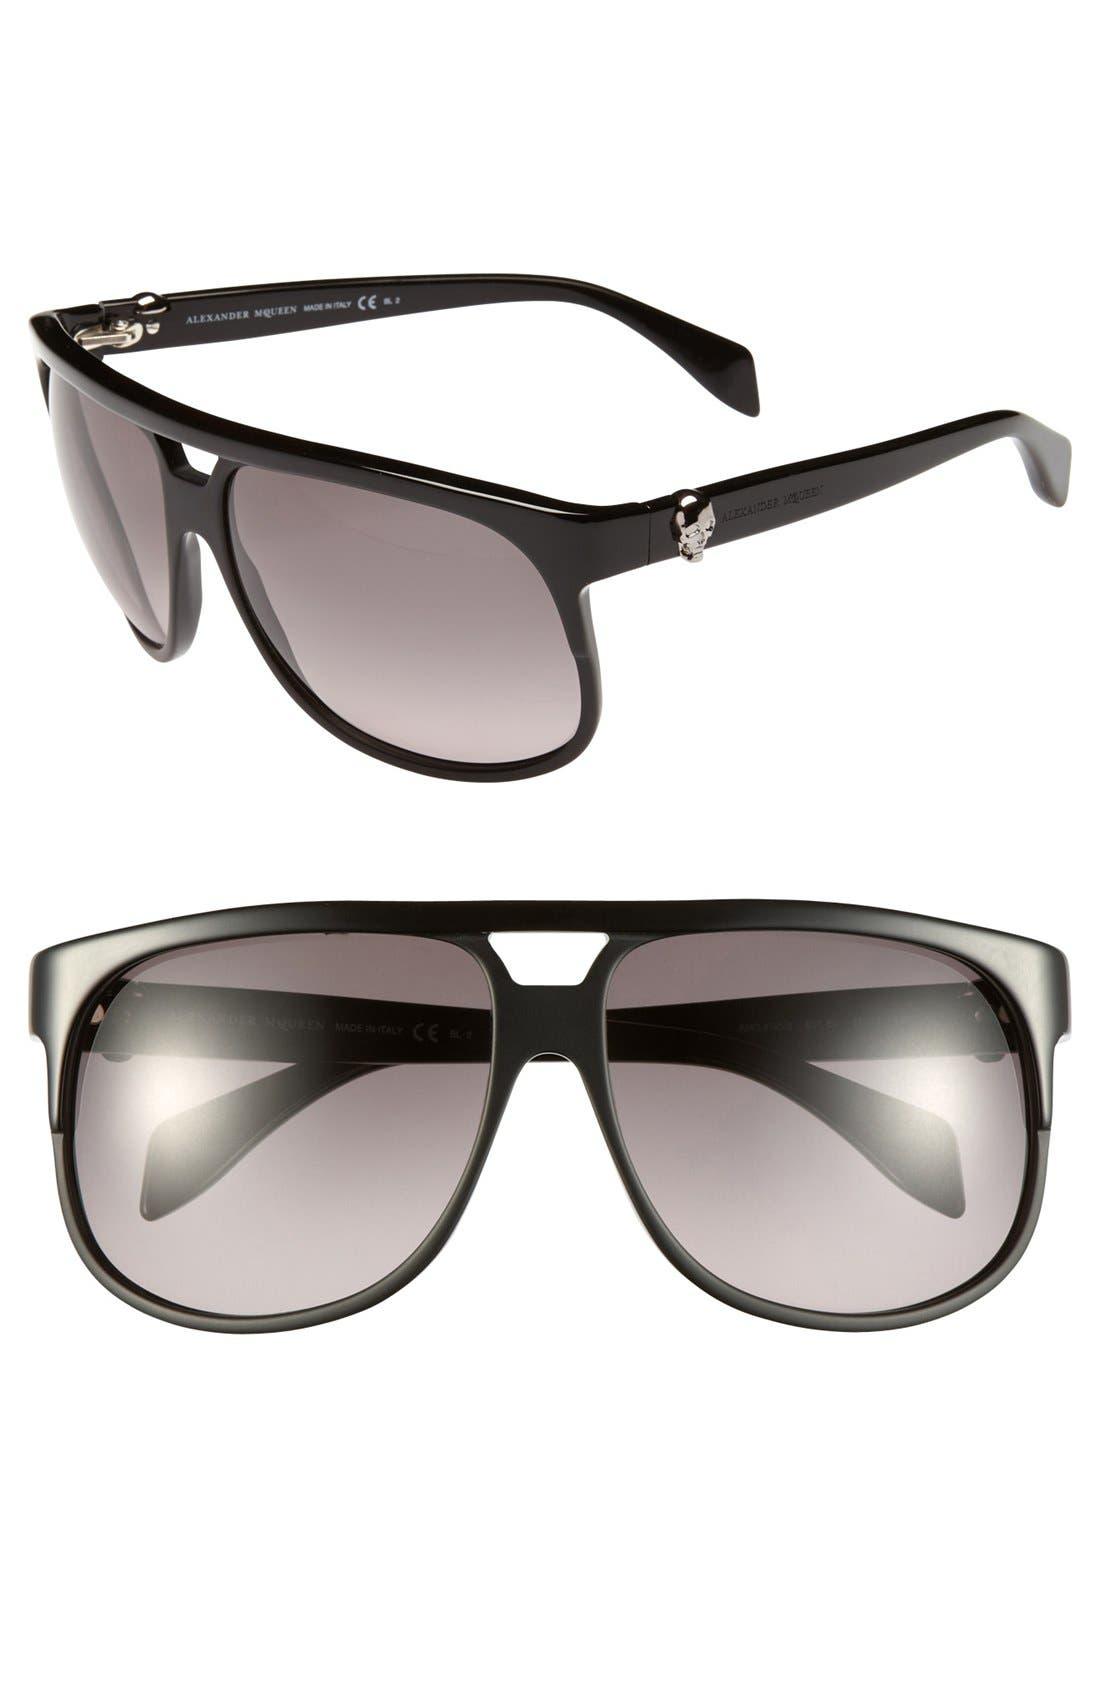 Main Image - Alexander McQueen 60mm Retro Sunglasses